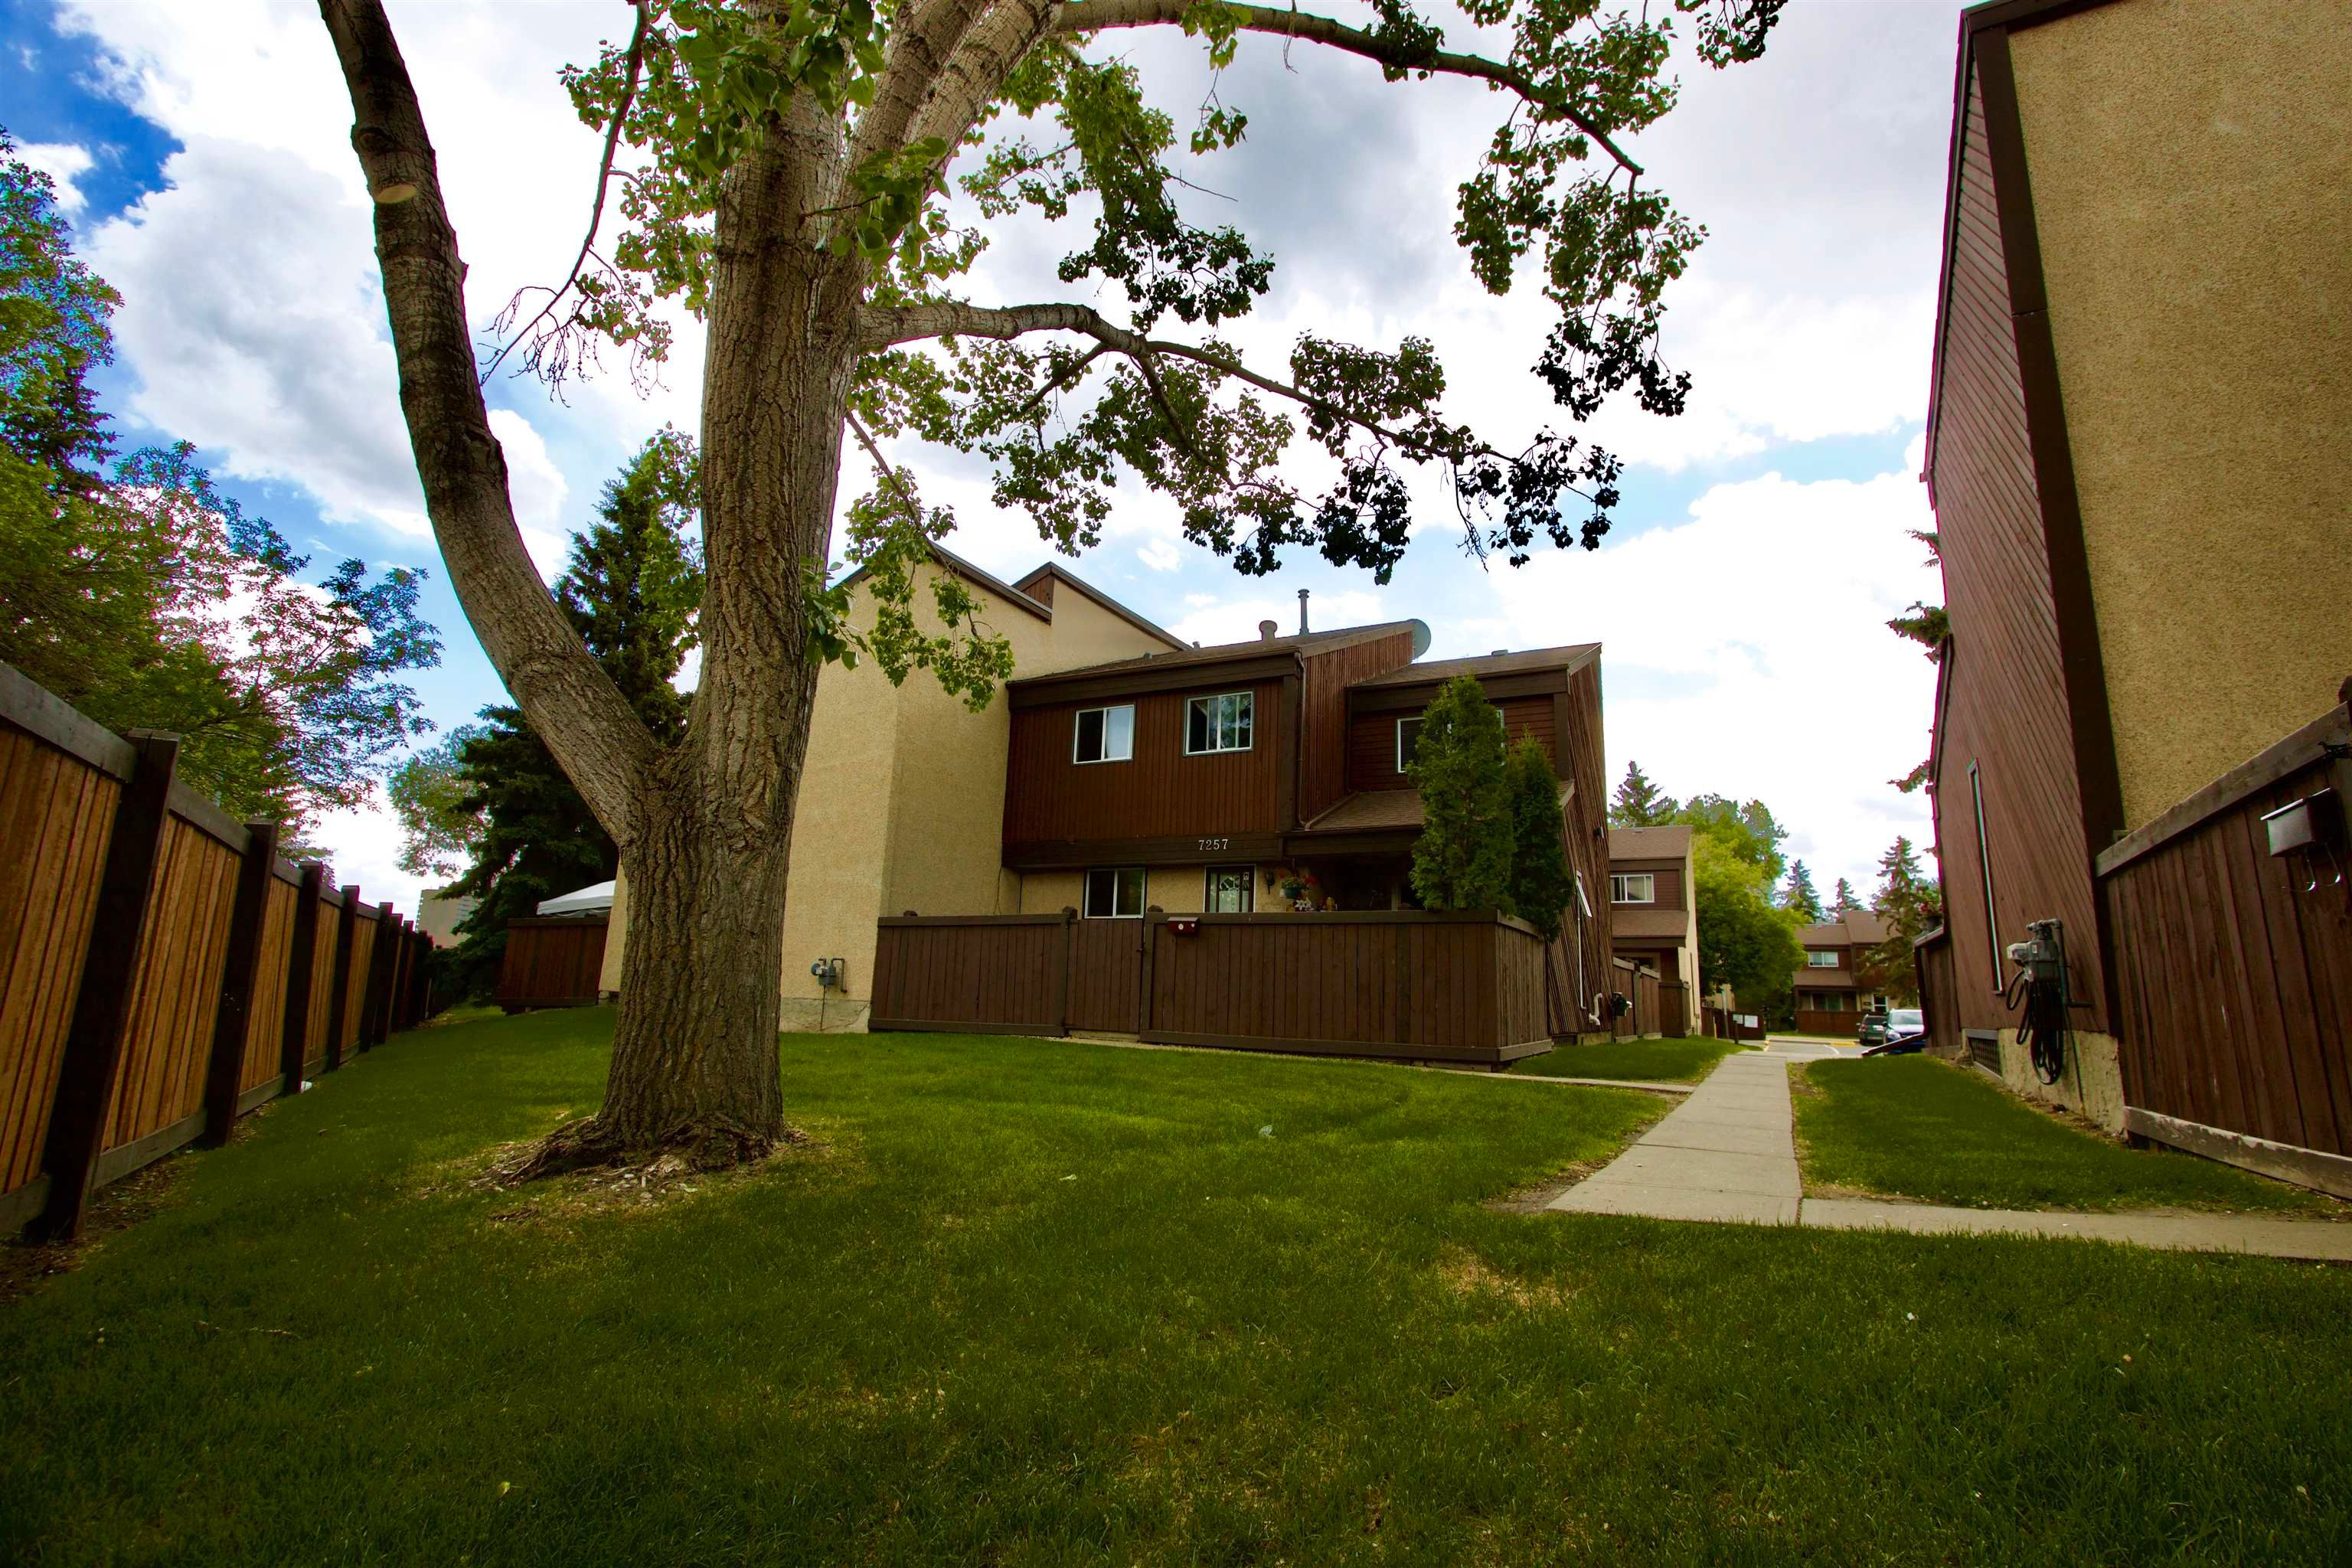 Main Photo: 7257 180 Street in Edmonton: Zone 20 Townhouse for sale : MLS®# E4263240